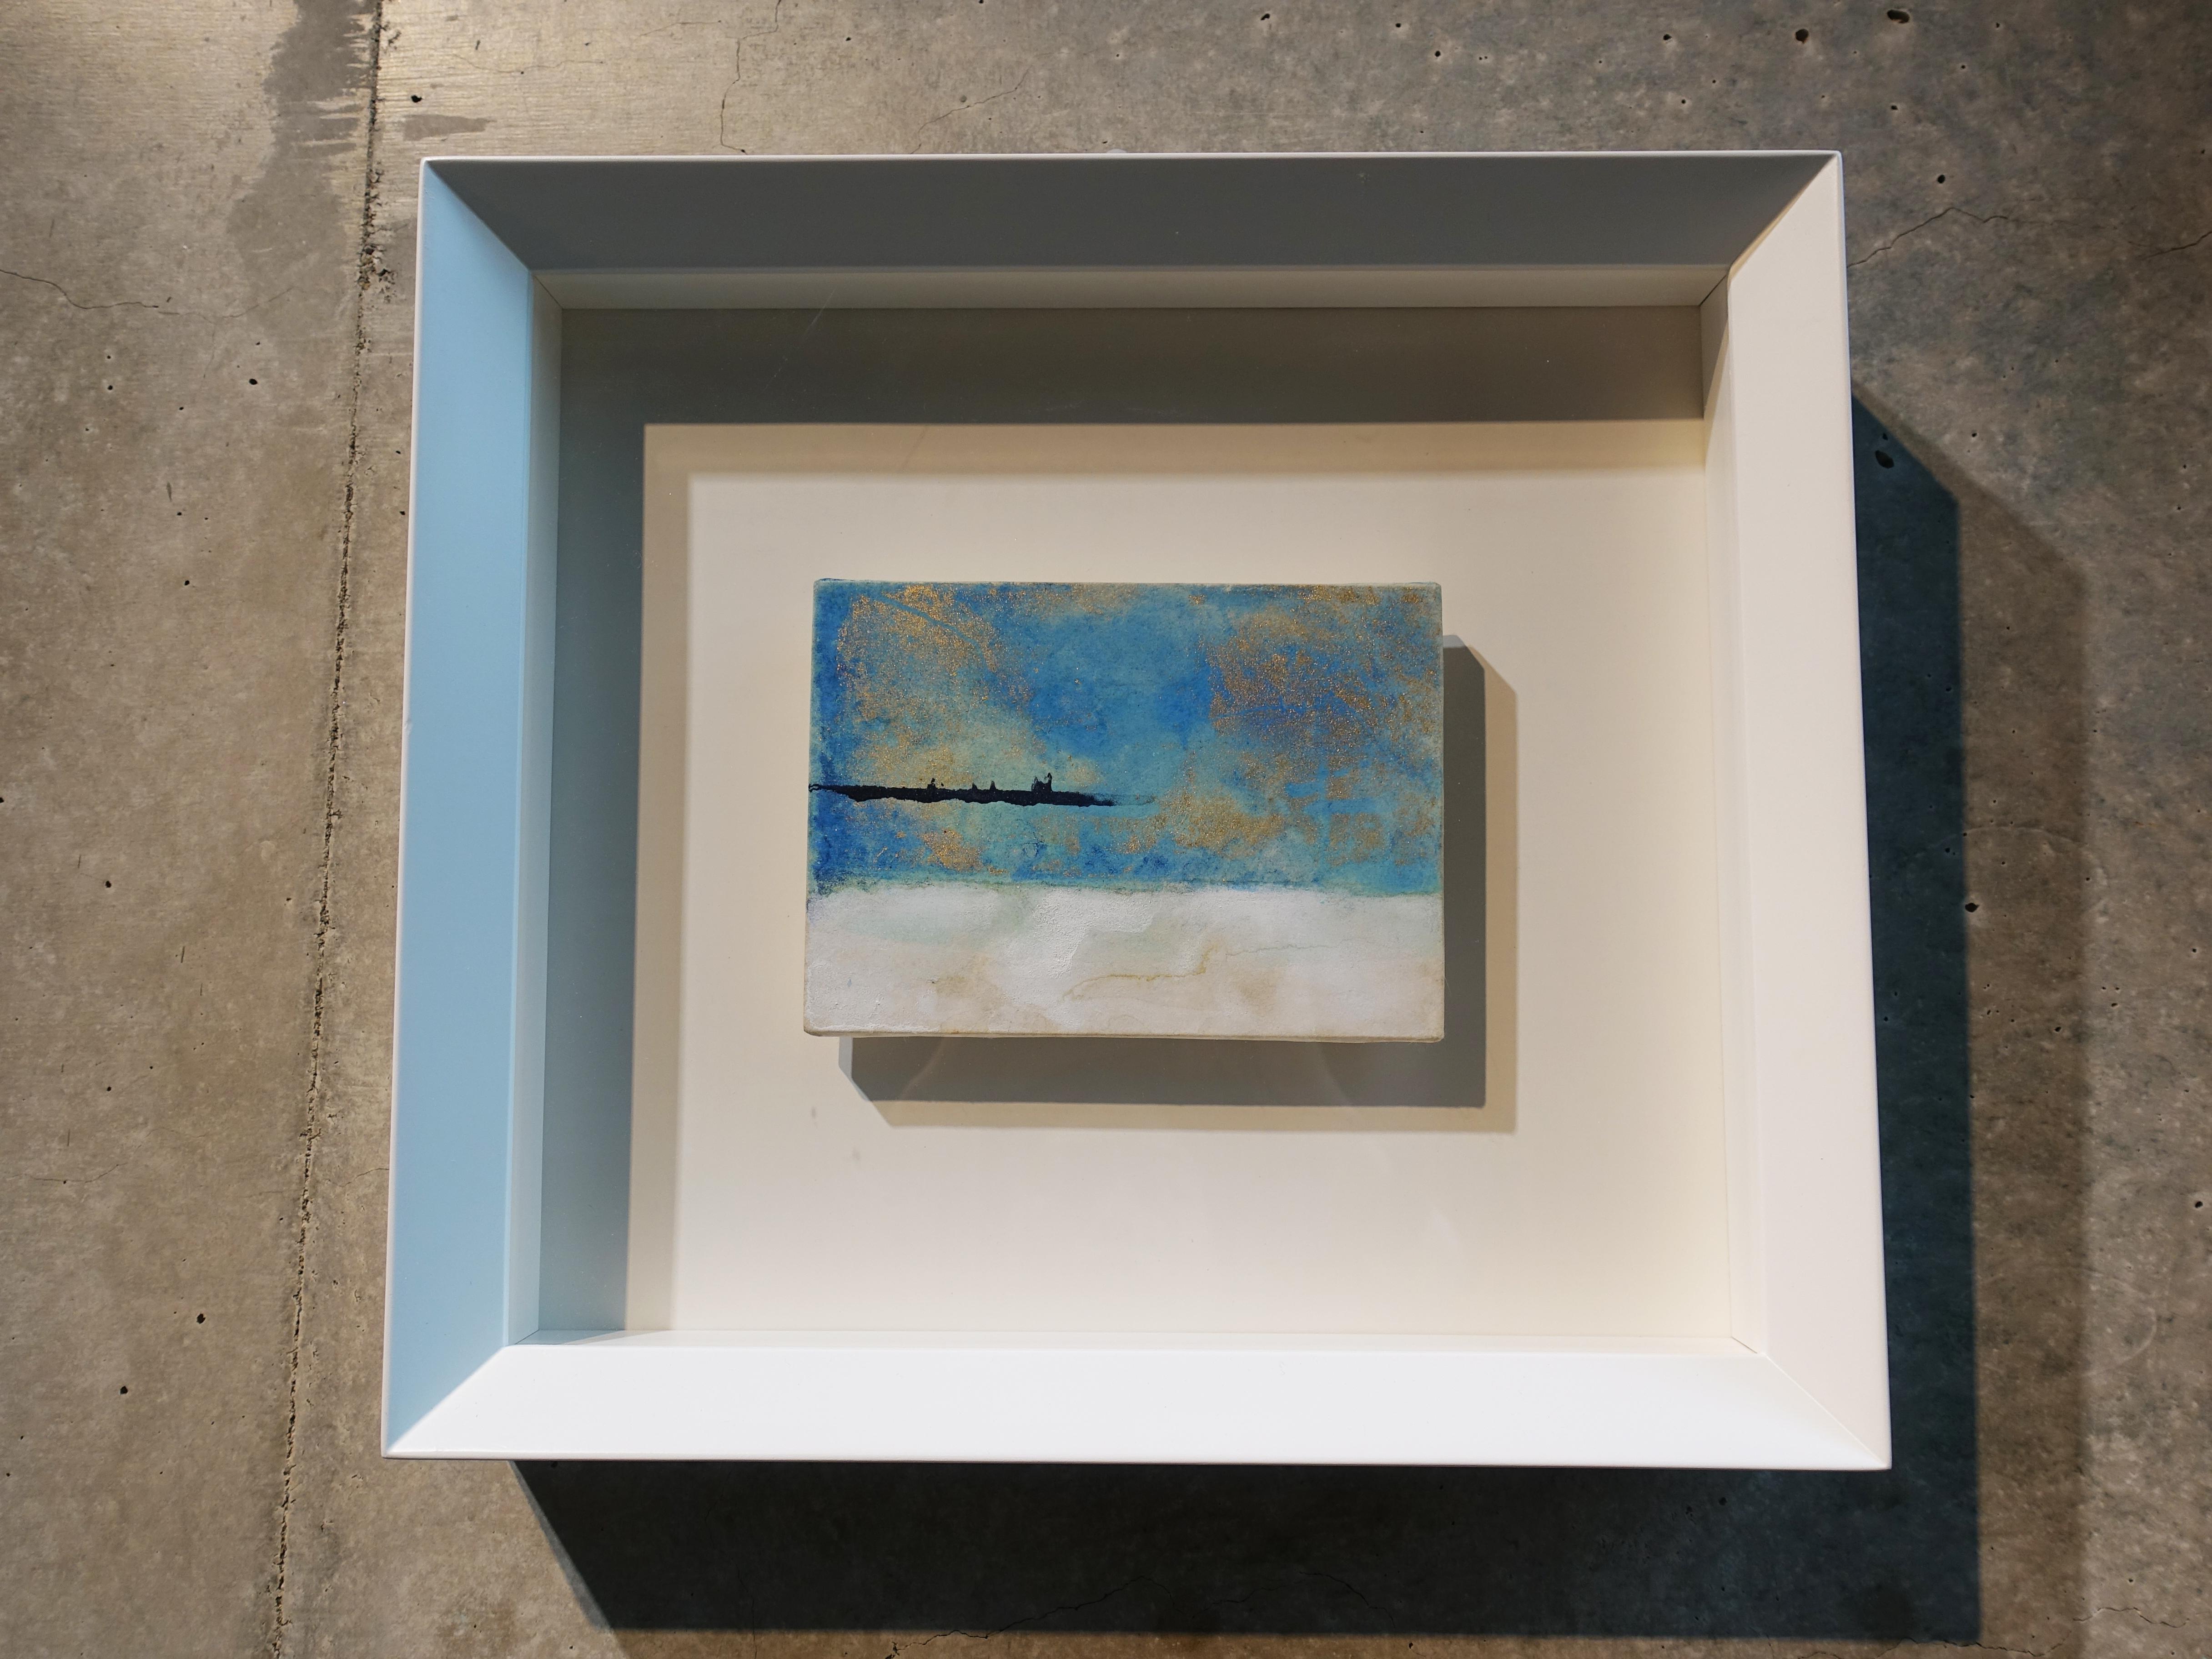 Makoto Fujimura,《無題-1》,13 x 18 cm,天然礦物顏料、金、雲肌紙,2017。